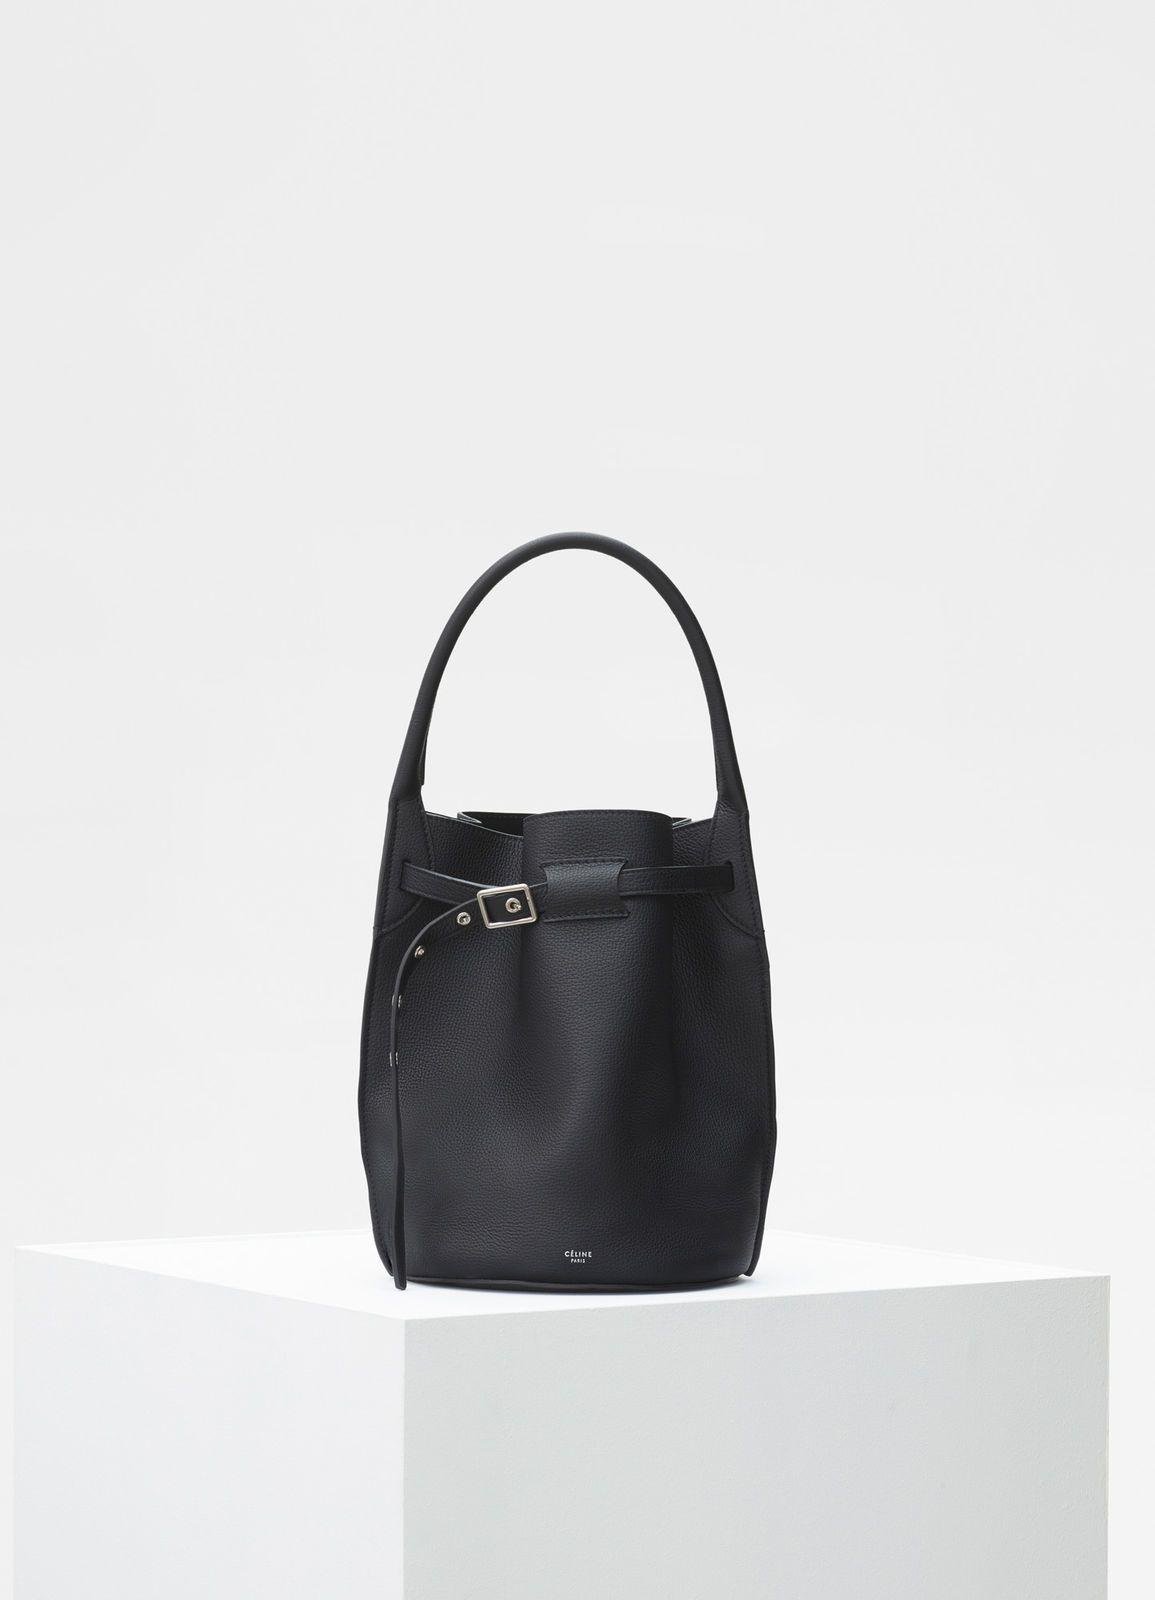 ca633a8c60 Big bag bucket in supple grained calfskin